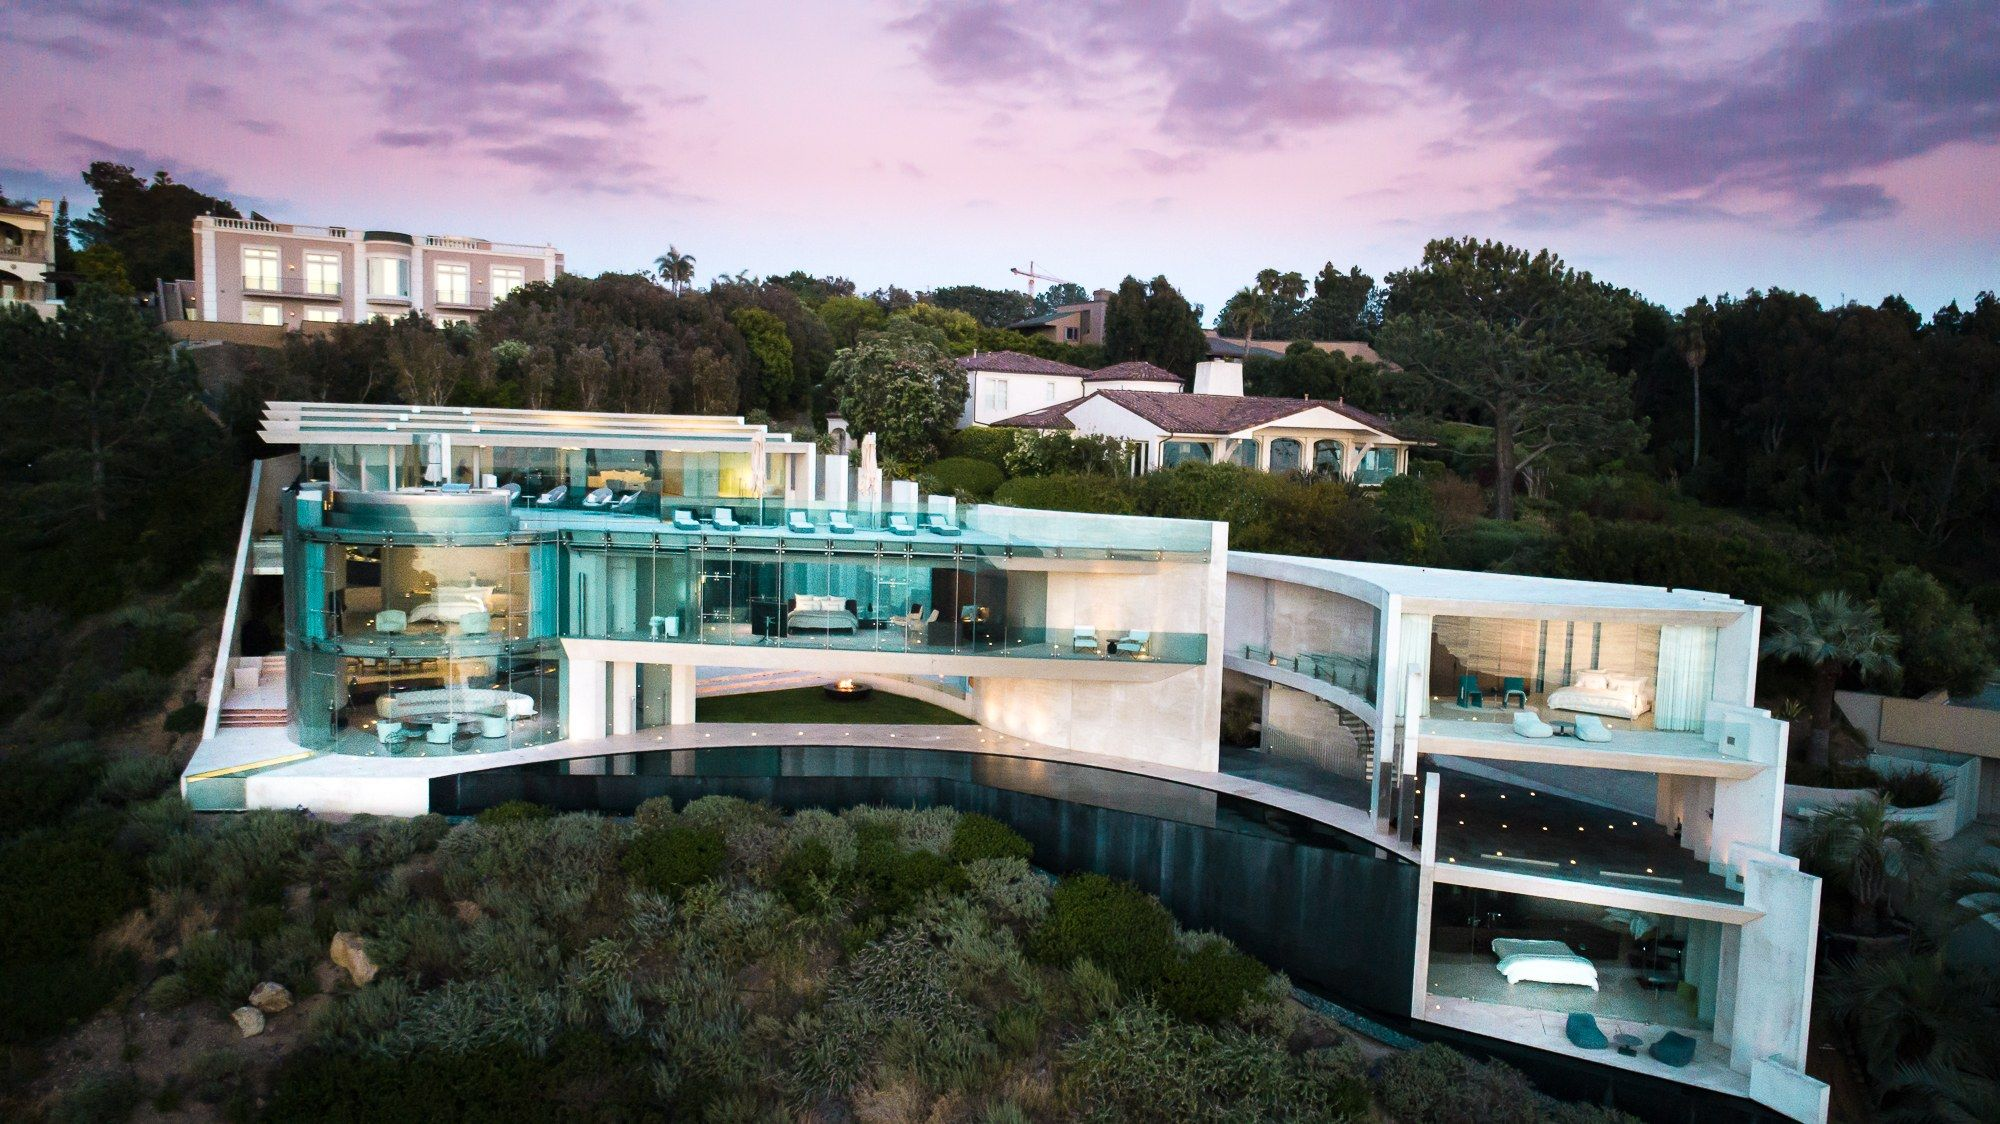 Alicia Keys Buys Wallace E Cunningham Designed Razor House For